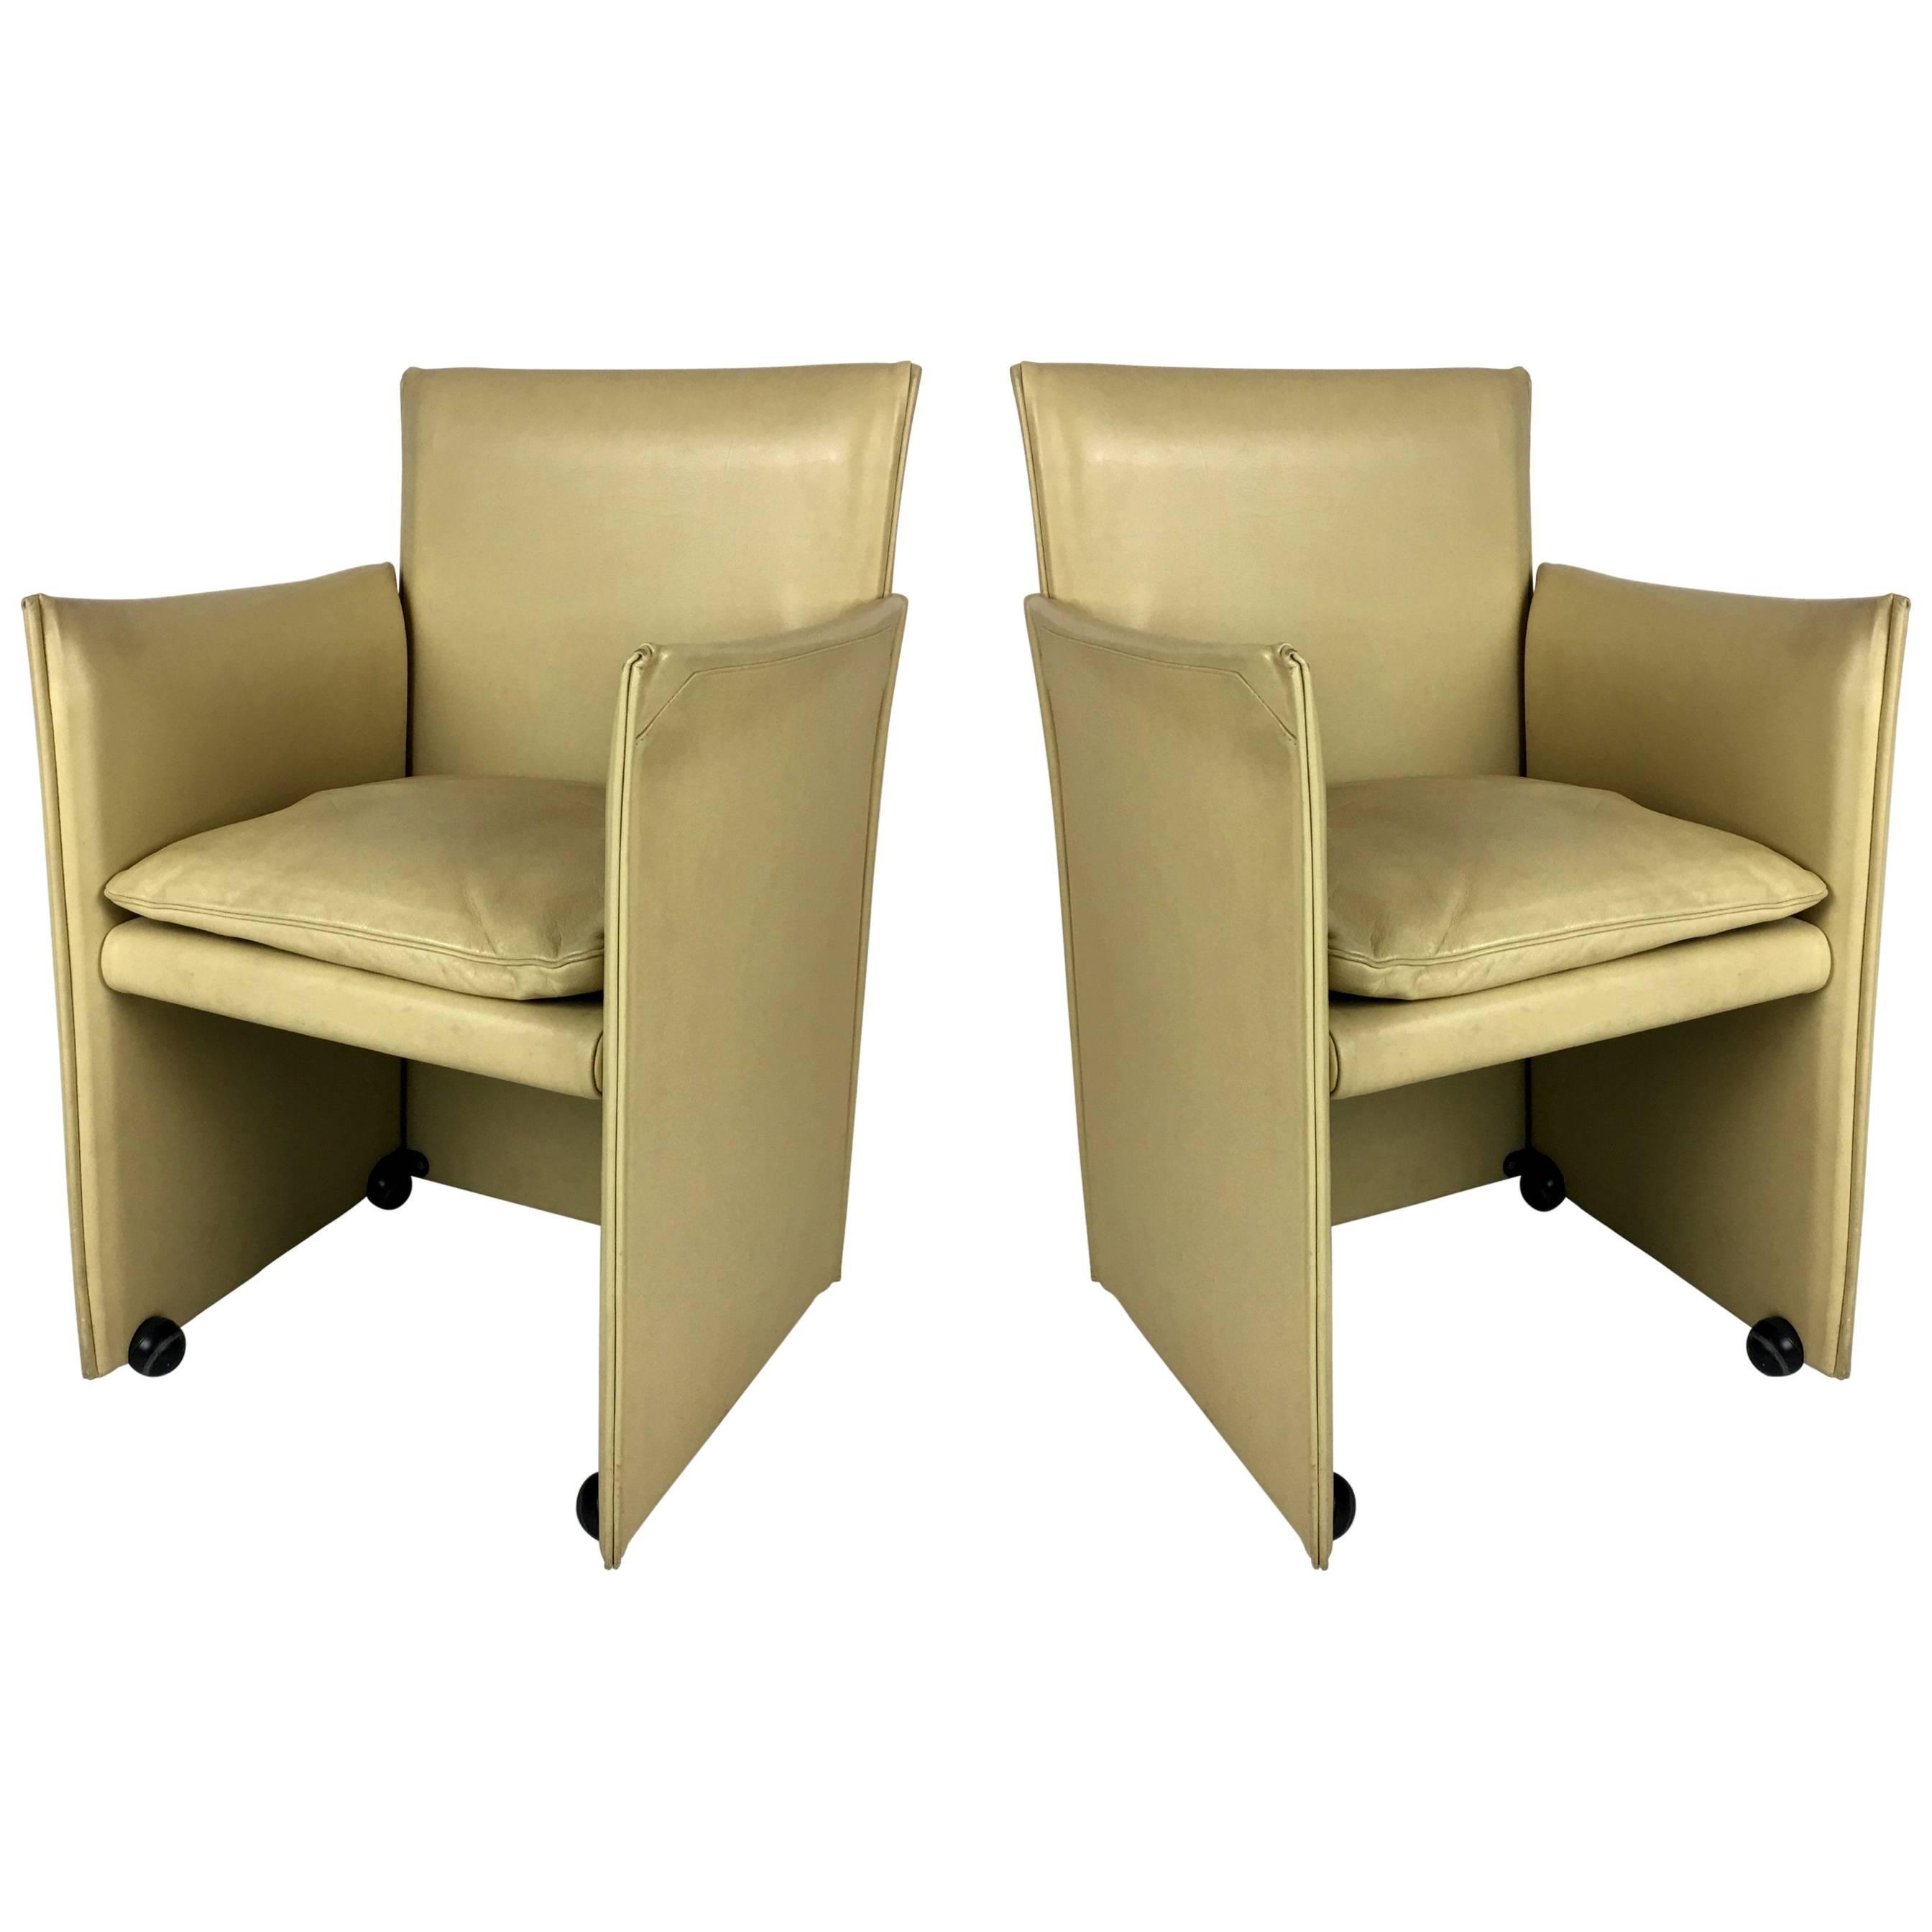 Break Chair by Mario Bellini for Cassina